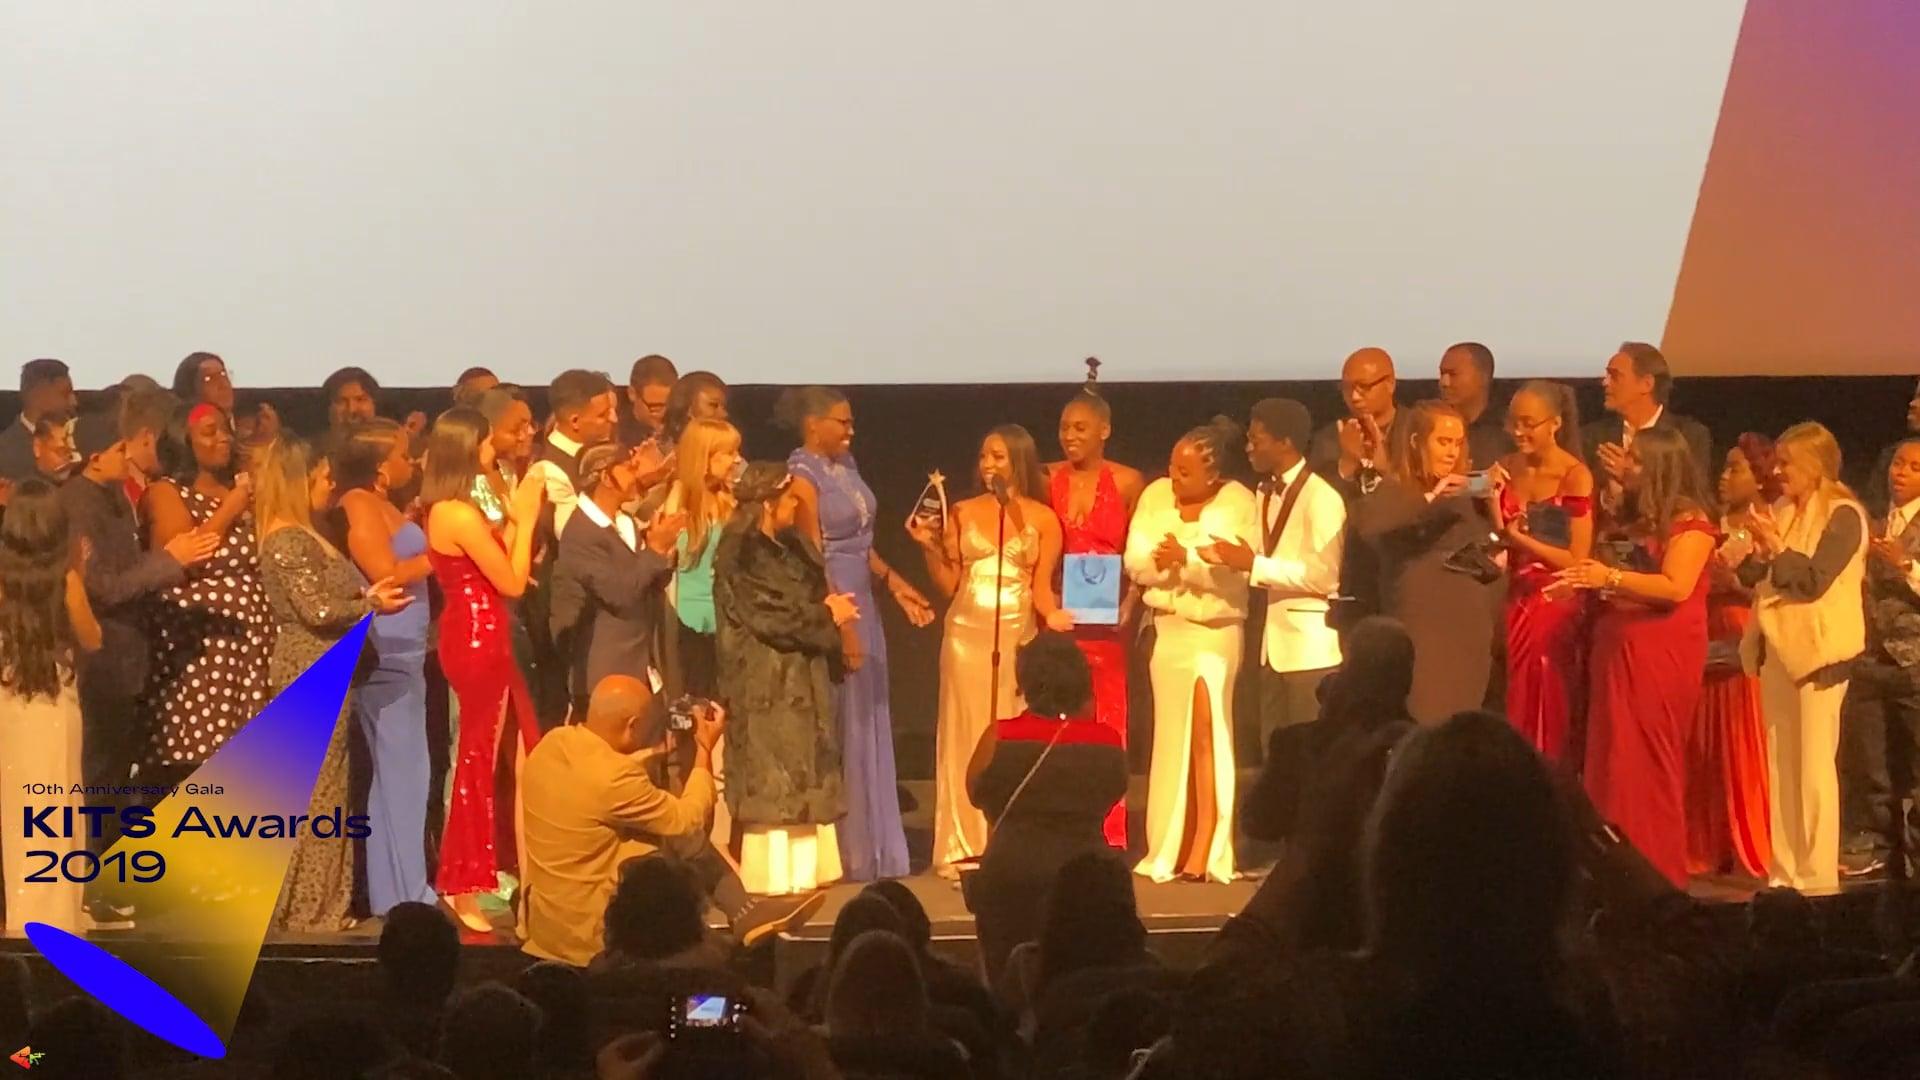 Kids In The Spotlight 10th Anniversary Film Awards 2019